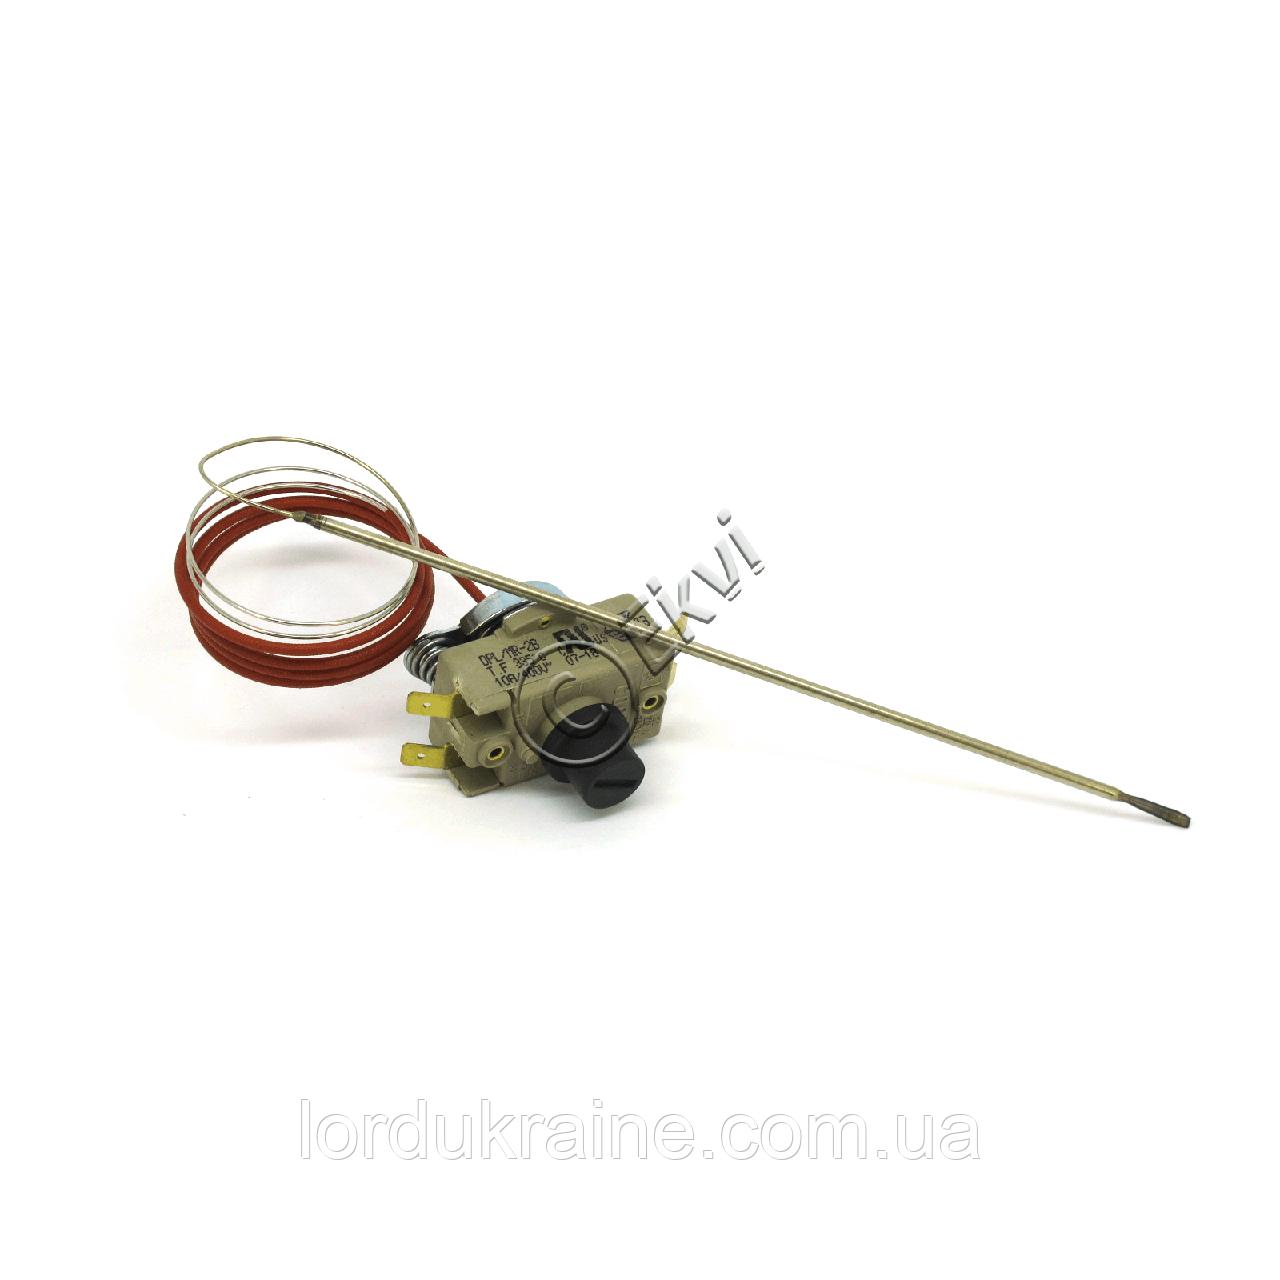 Термостат защитный KTR1134A TR254 для печи Unox XF 090